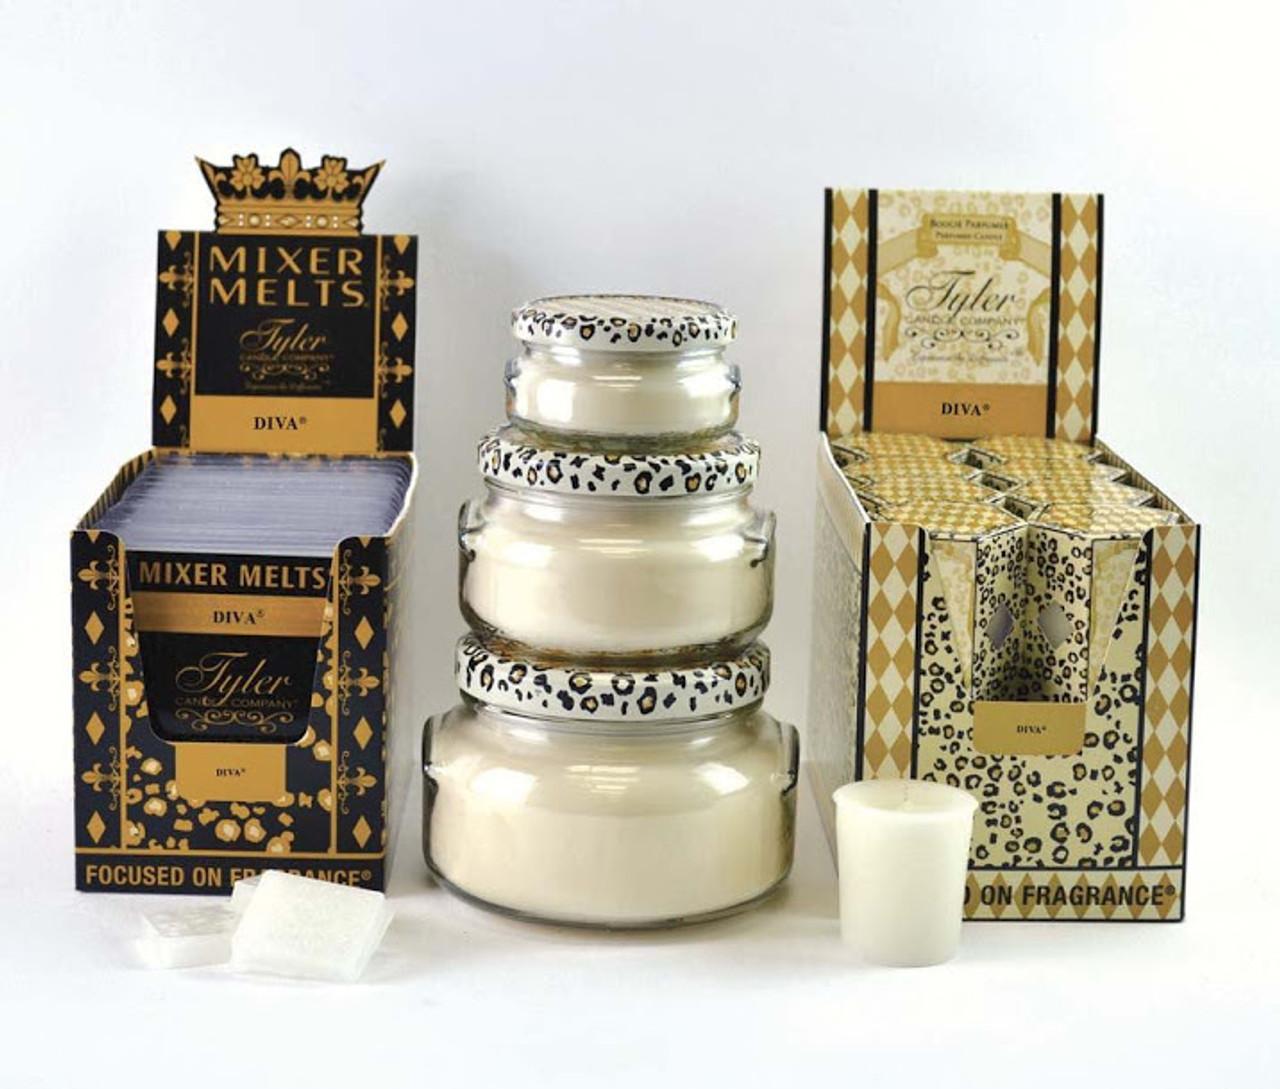 DIVA® Mixer Melts Tyler Candle Company